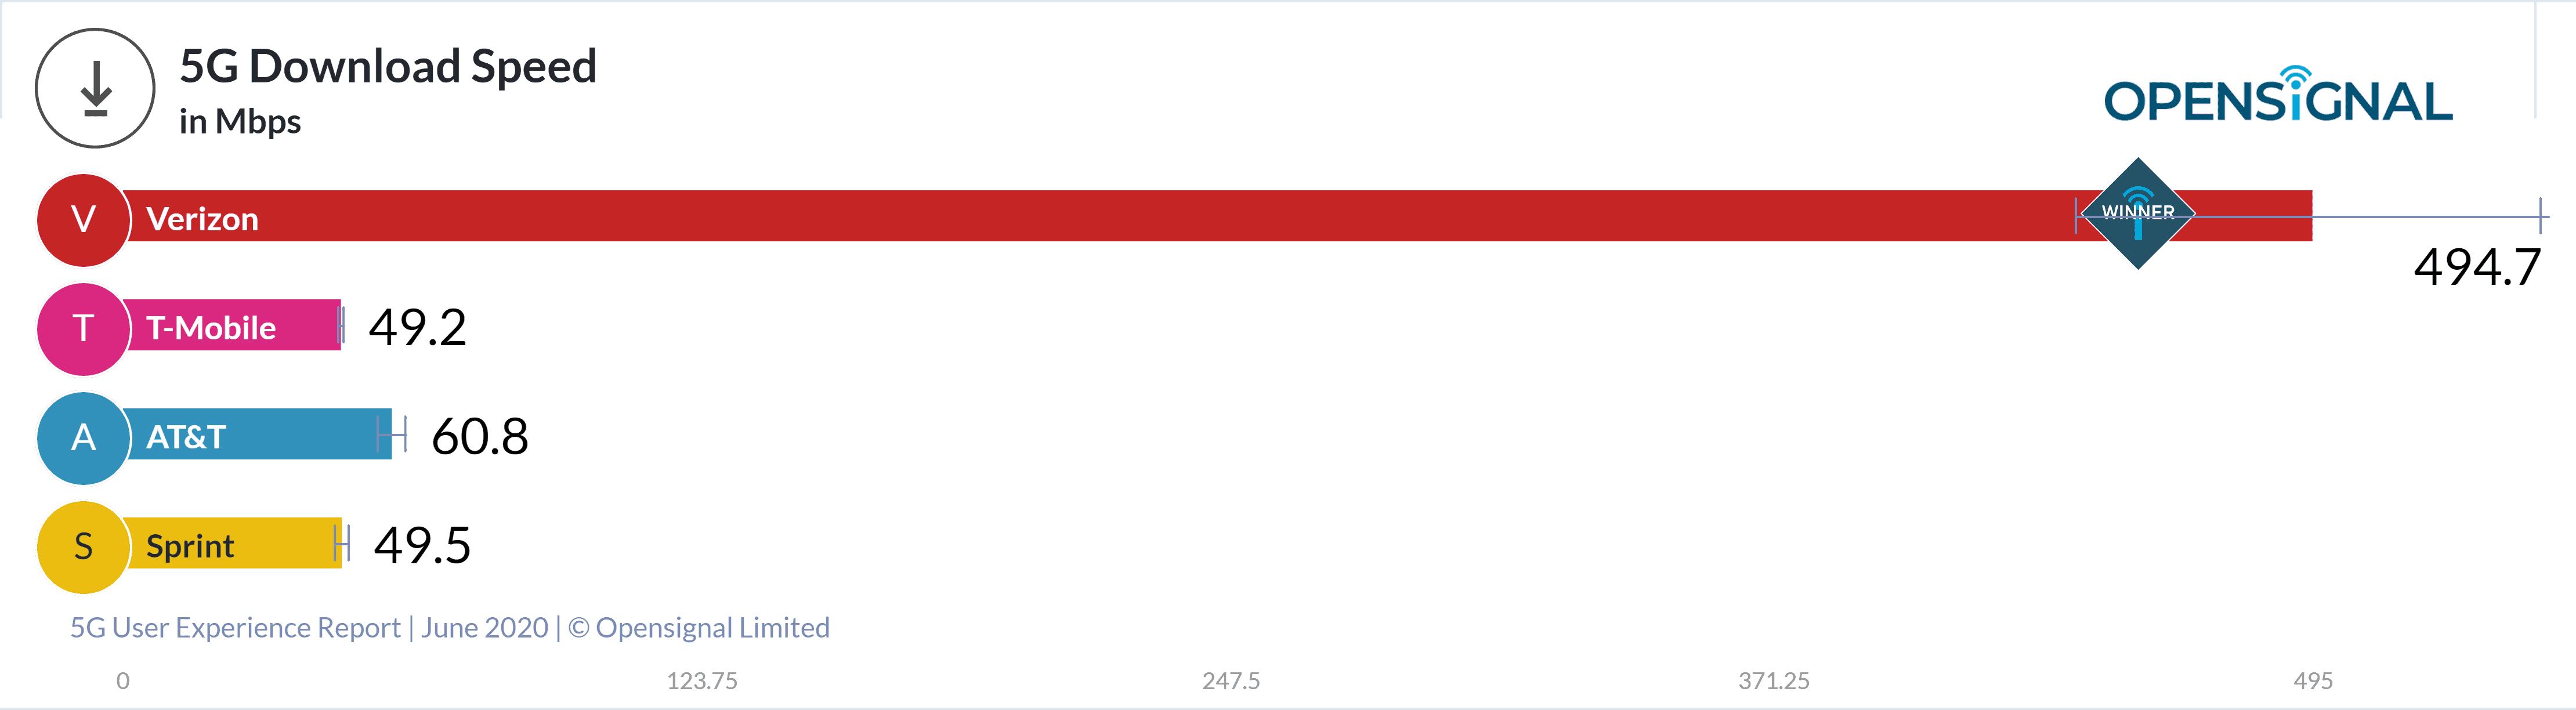 Opensignal chart Verizon fastest 5G speeds